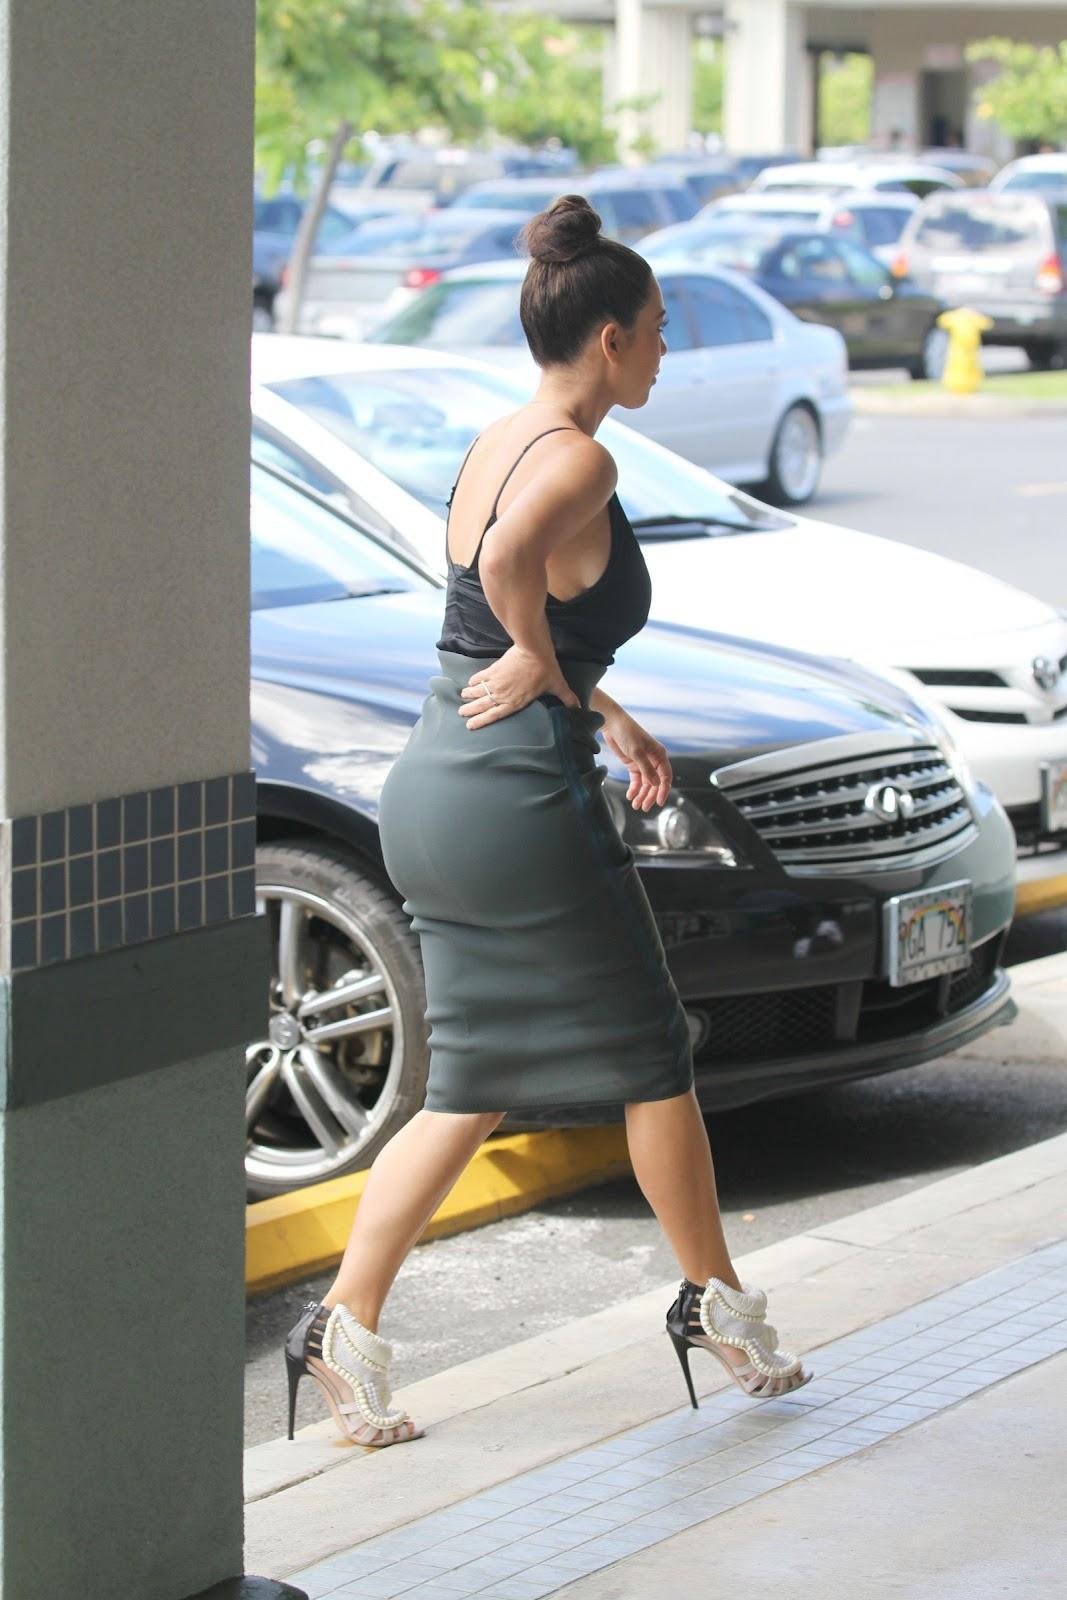 http://3.bp.blogspot.com/-q617xHsEdVw/UDCSU1dWSWI/AAAAAAAA7jc/yQHbfKxTkAo/s1600/Kim-Kardashian-27.jpg